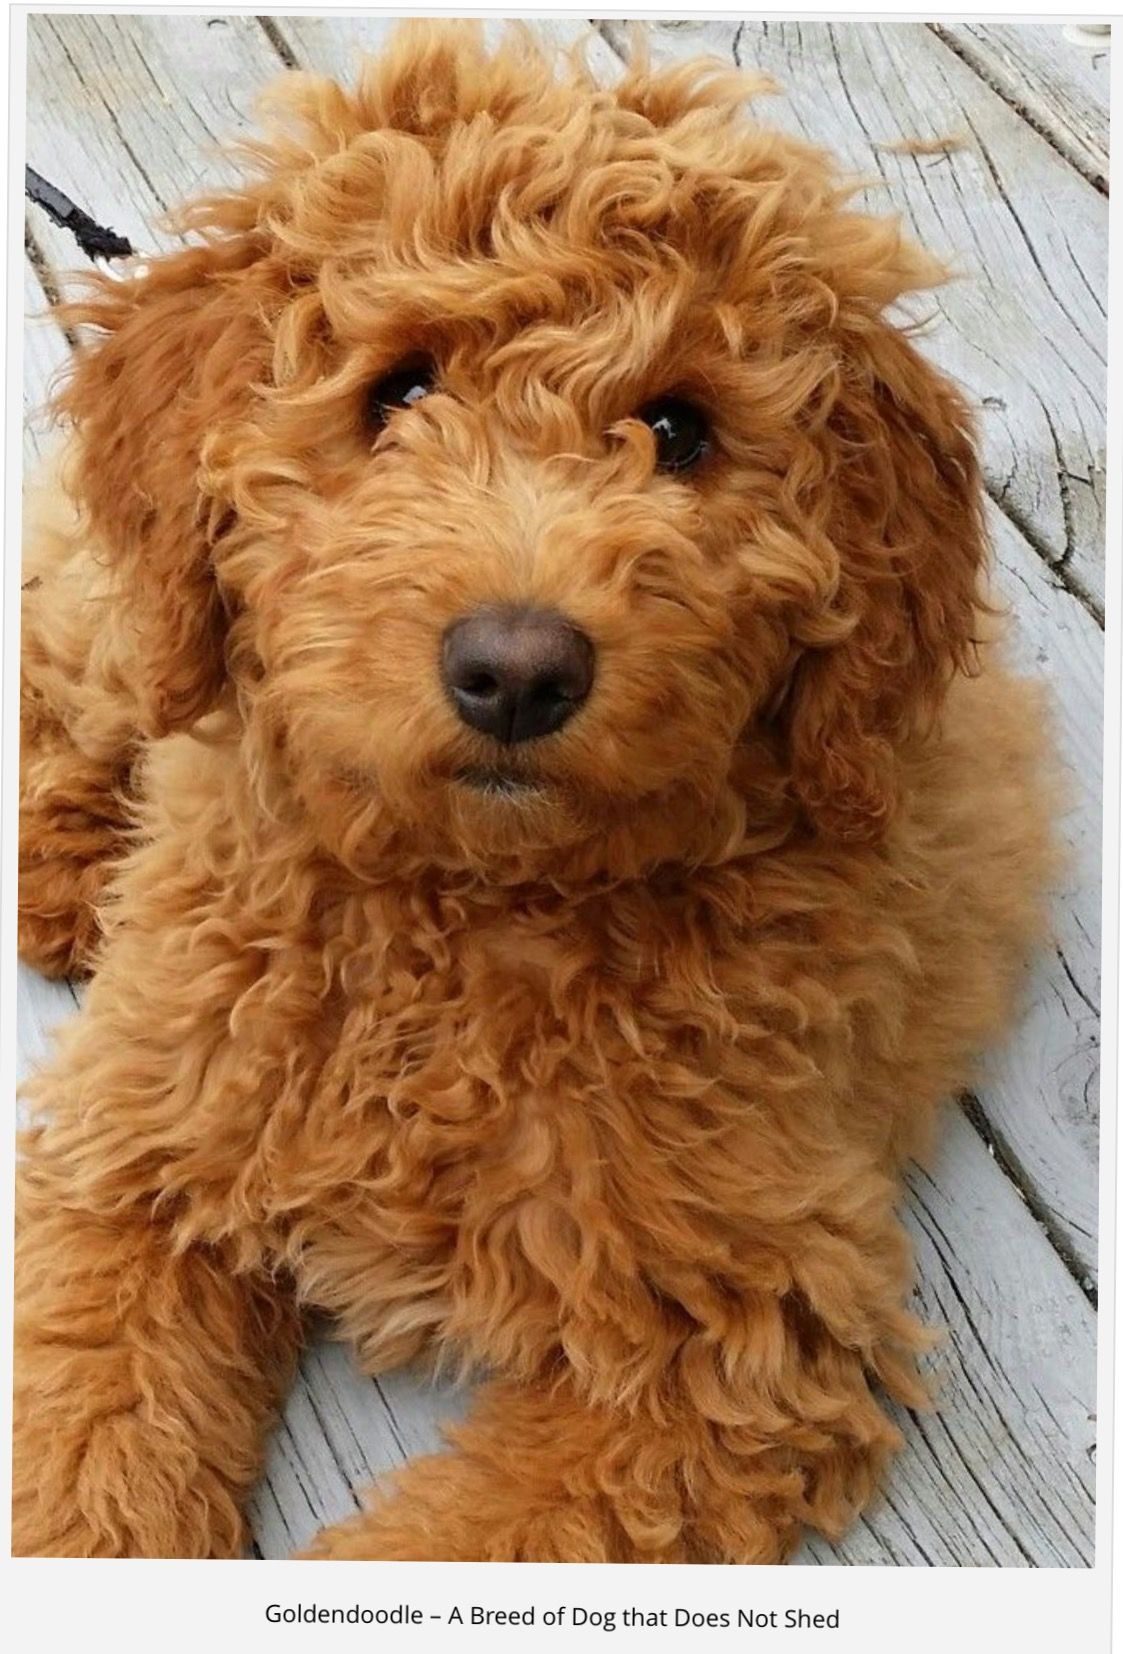 Pin By Janet Mckelvey On Golden Doodles Doodle Dog Breeds Cute Dogs Golden Doodle Dog